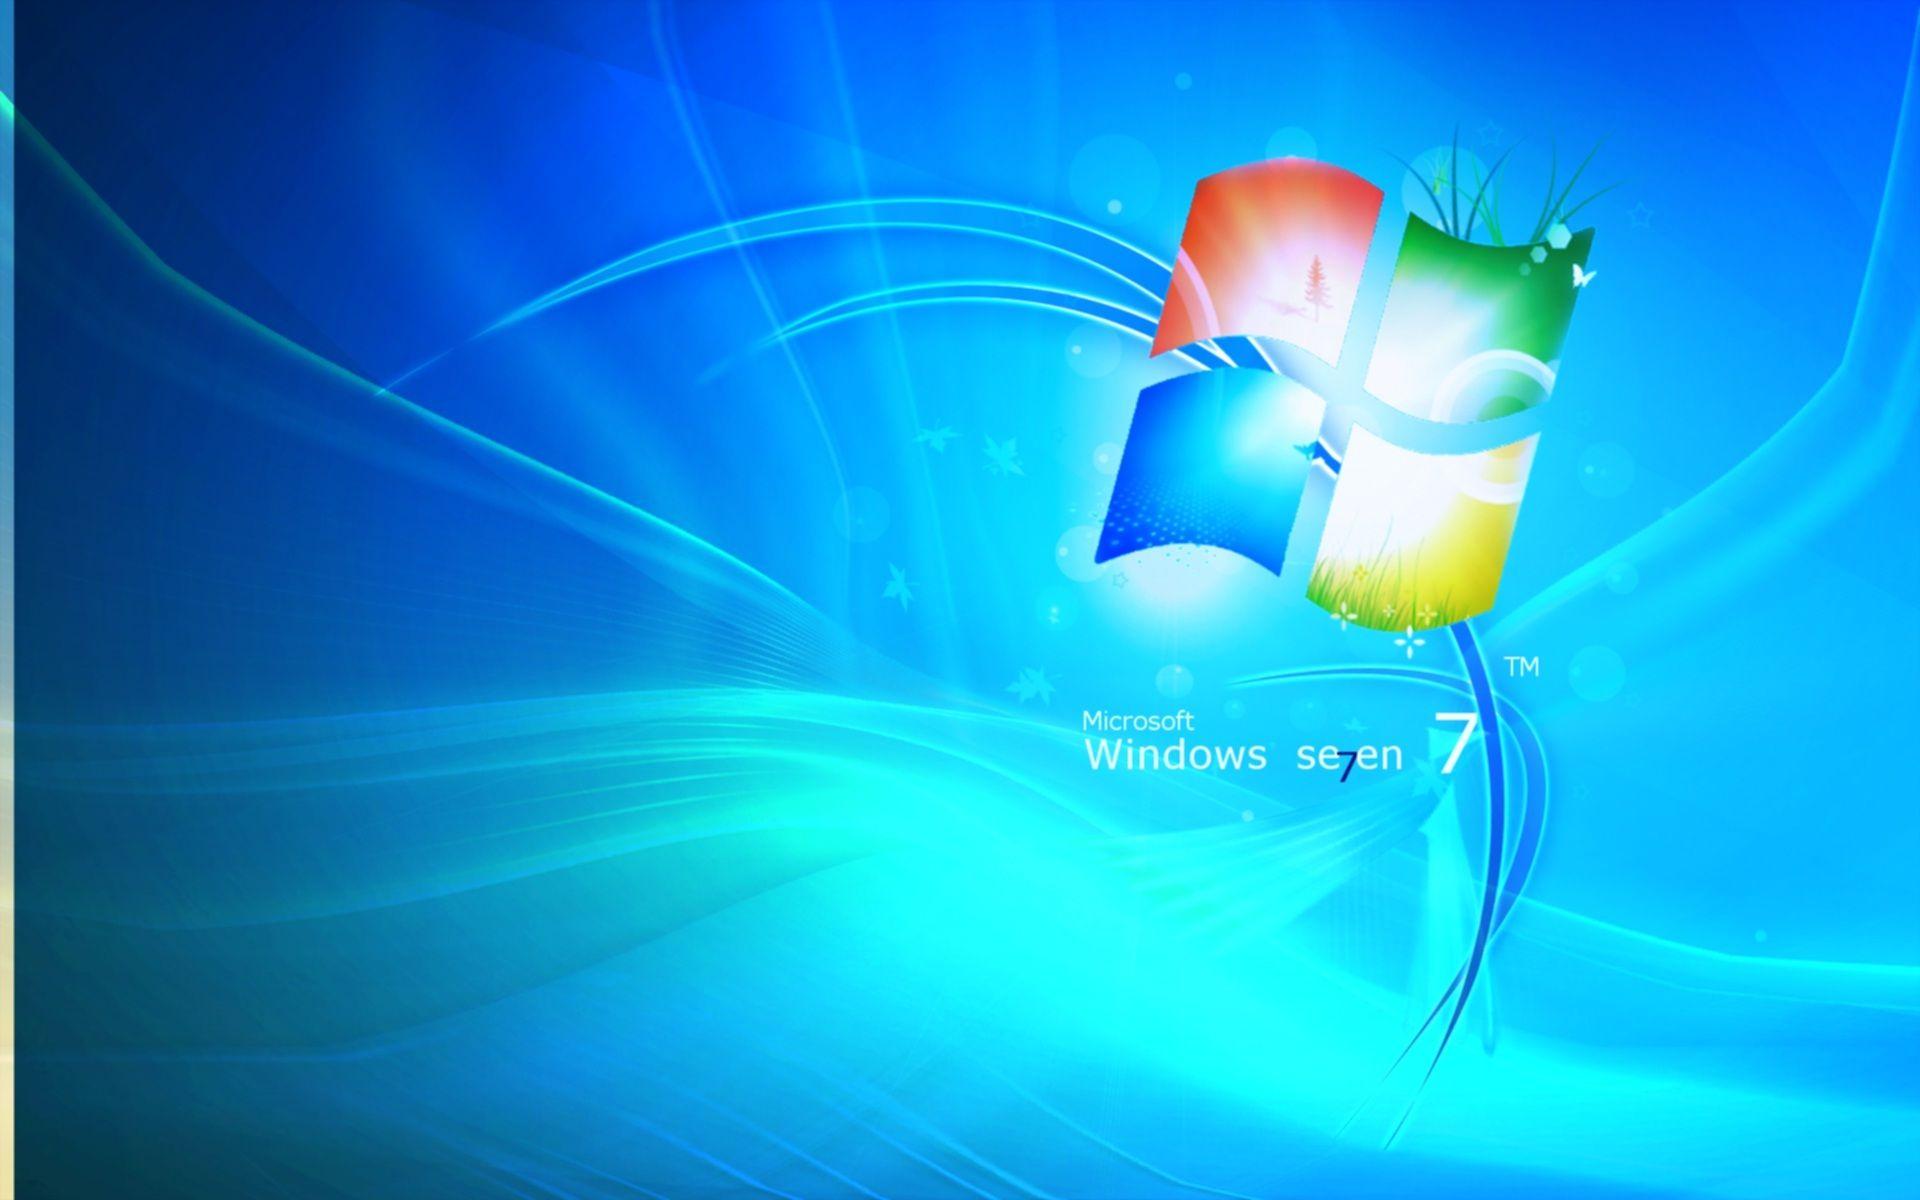 Microsoft free desktop backgrounds 19201200 microsoft desktop microsoft free desktop backgrounds 19201200 microsoft desktop backgrounds 29 wallpapers adorable voltagebd Choice Image